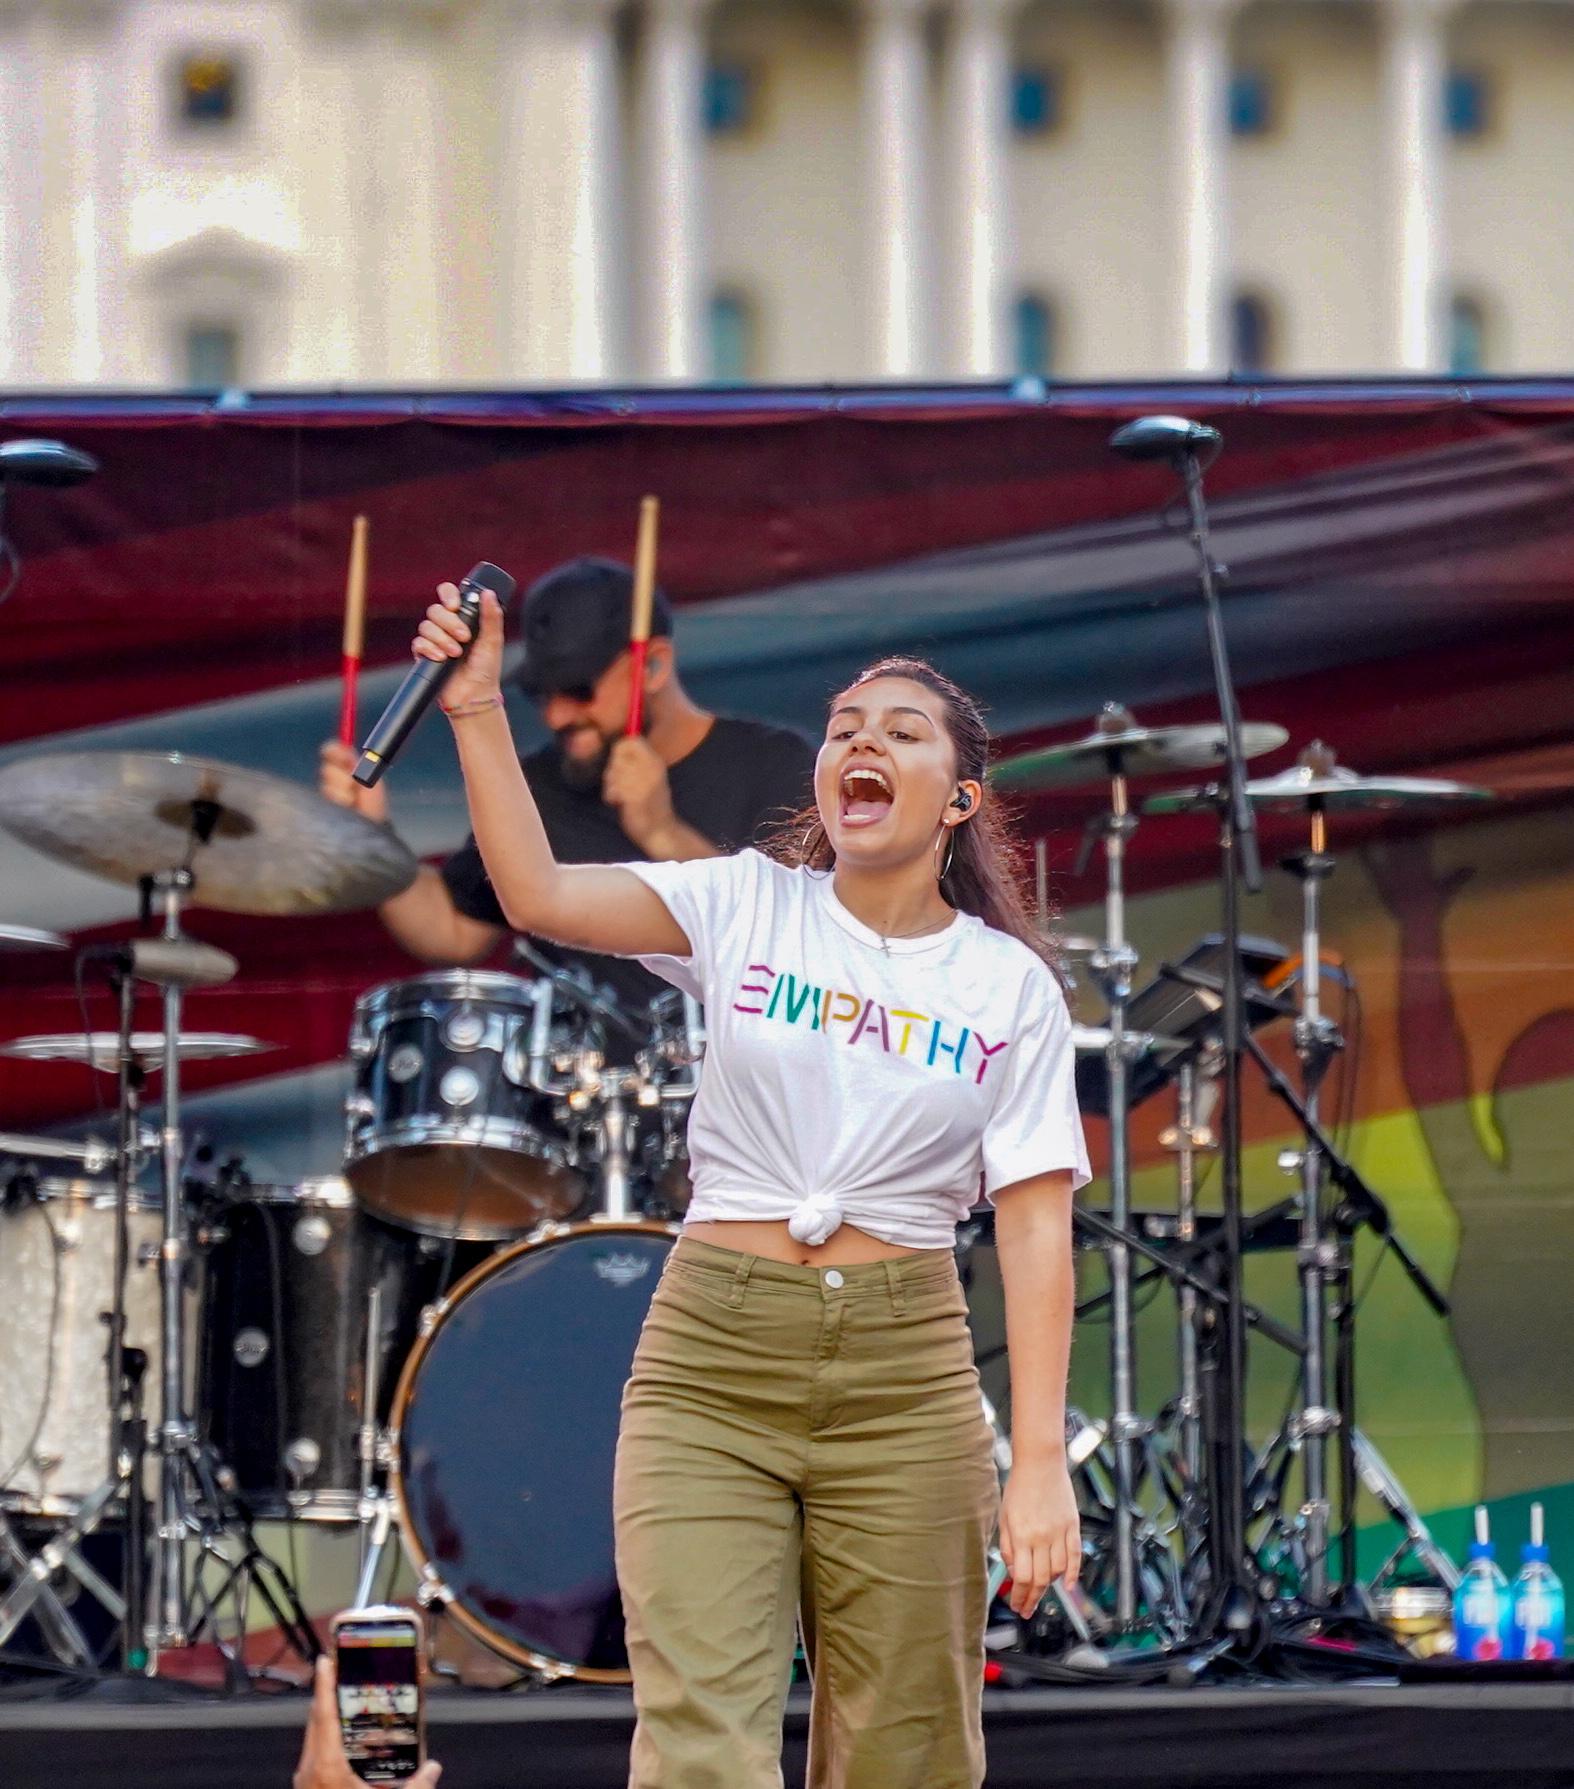 2018.06.10 Alessia Cara at the Capital Pride Concert with a Sony A7III, Washington, DC USA 03560 (41835510255).jpg